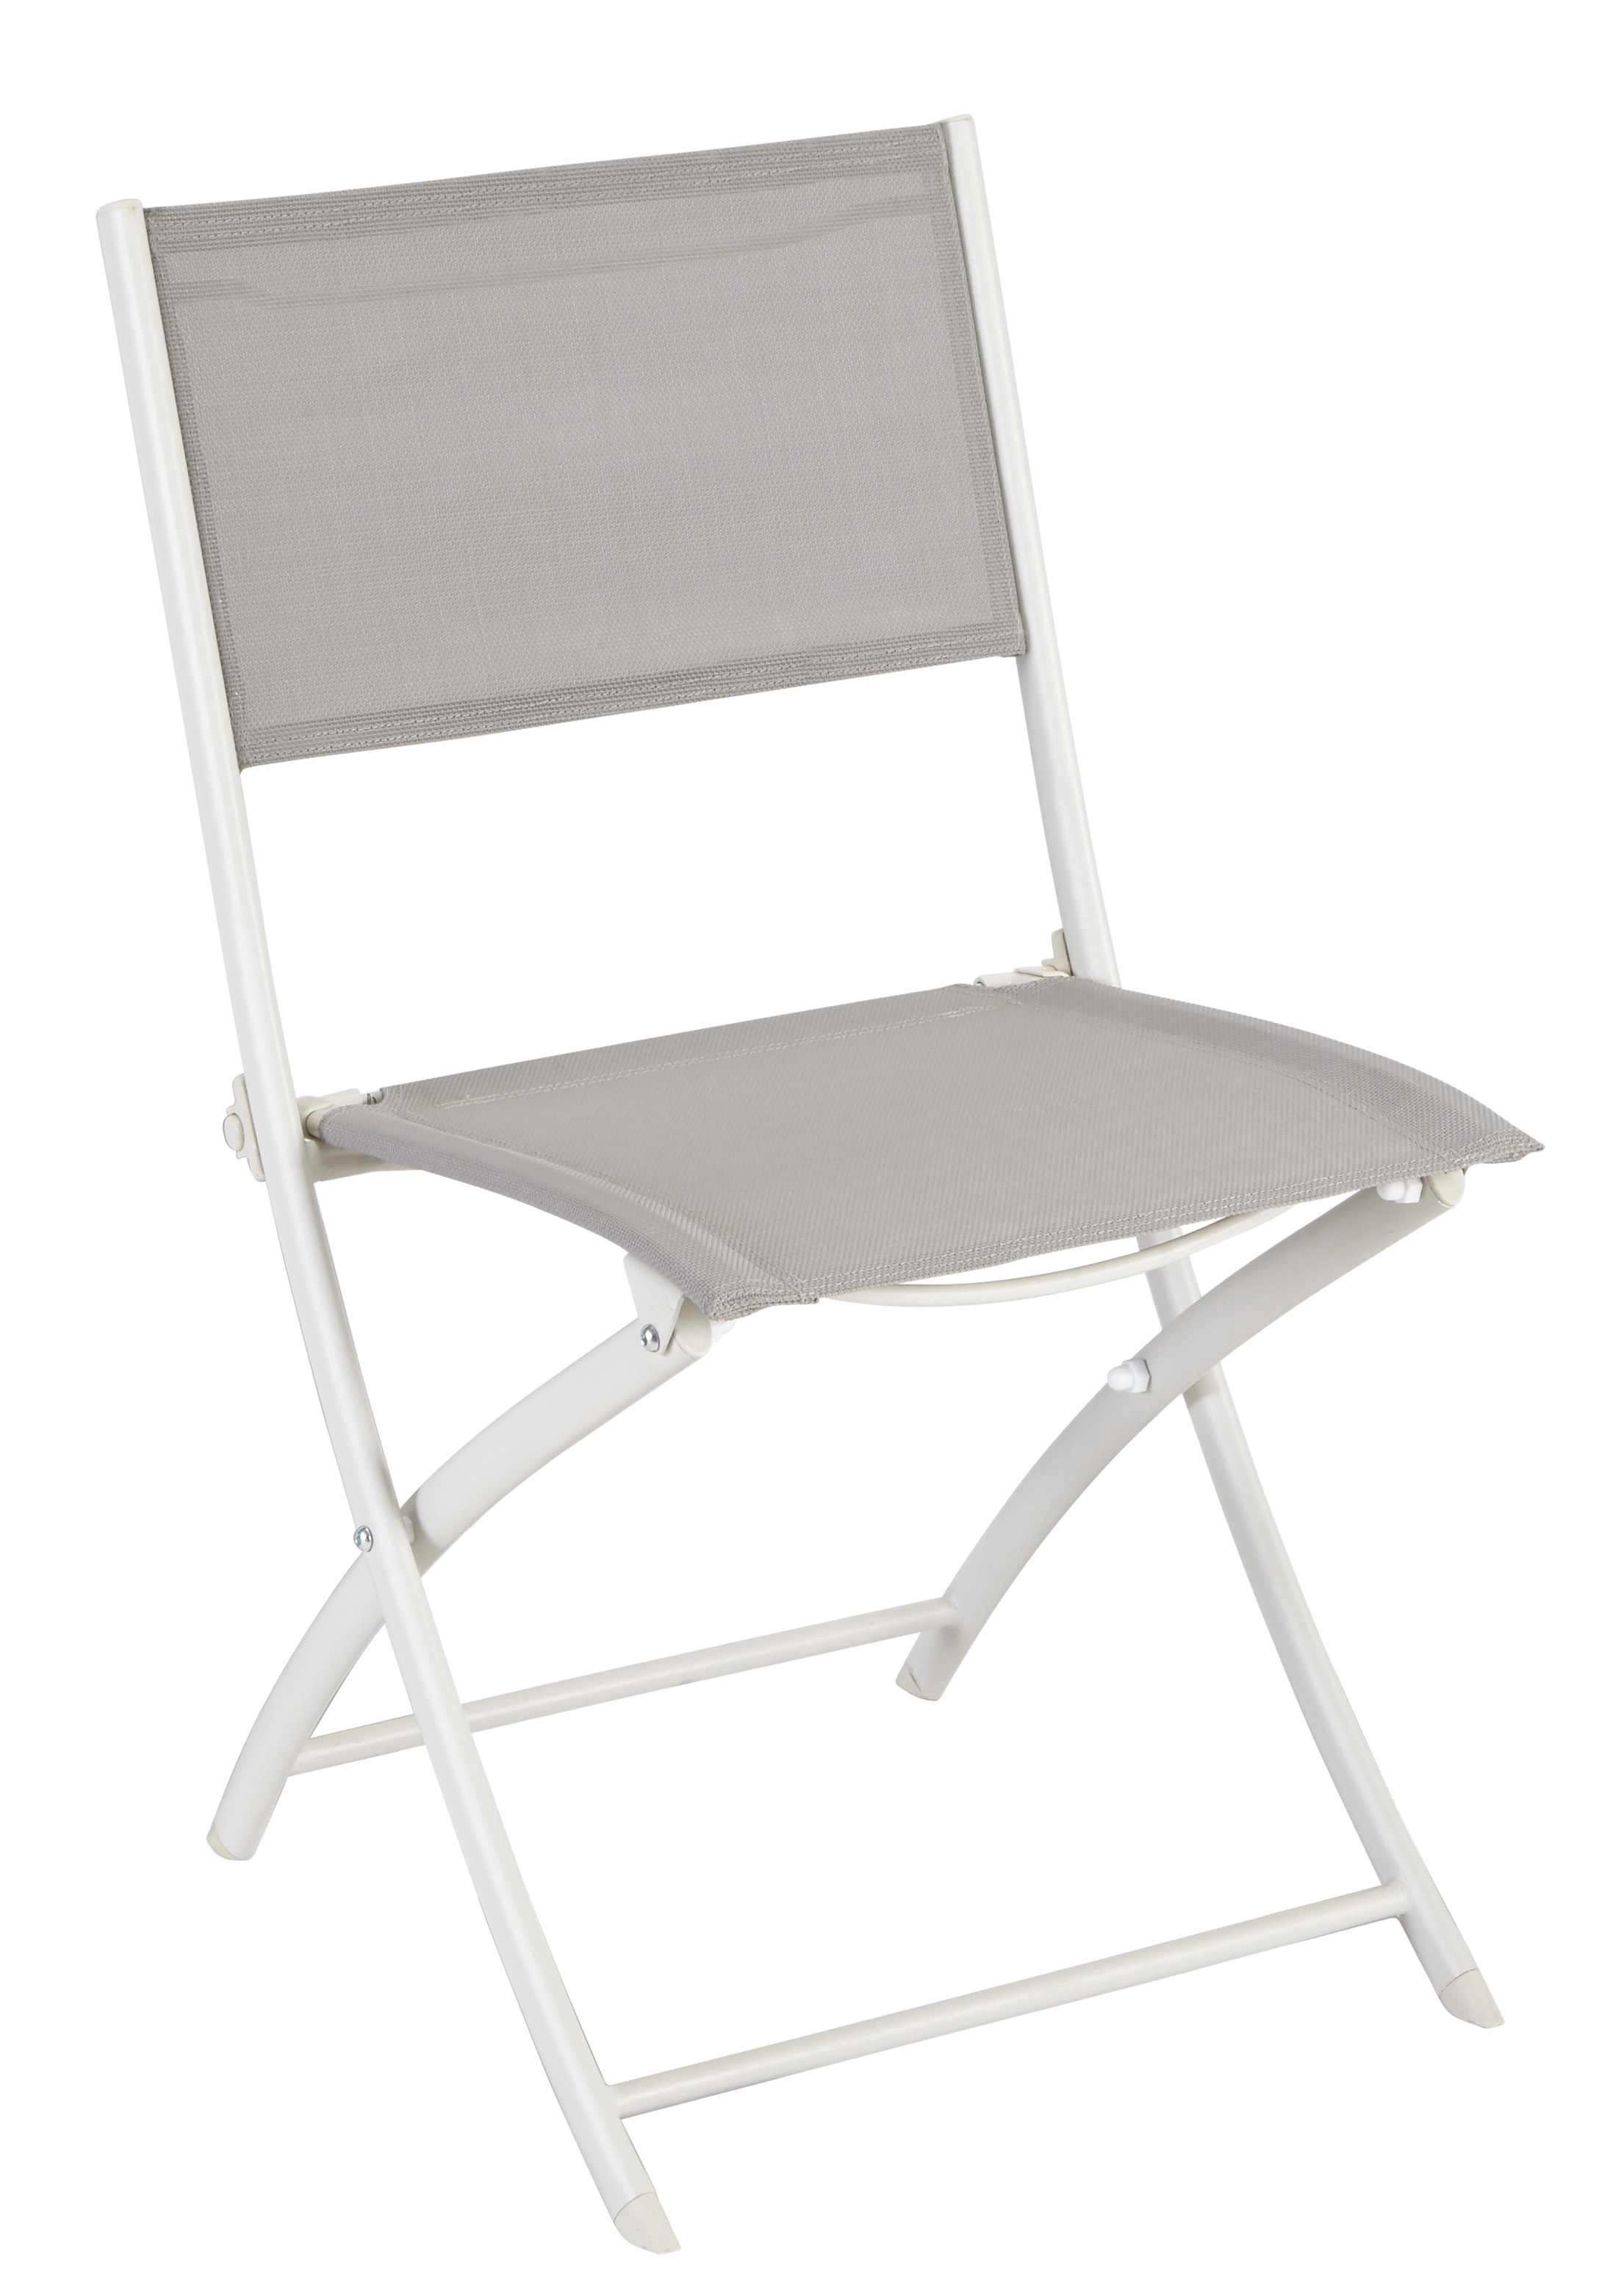 Carrefour Chaise Tello Pliante Taupe Pas Cher Achat